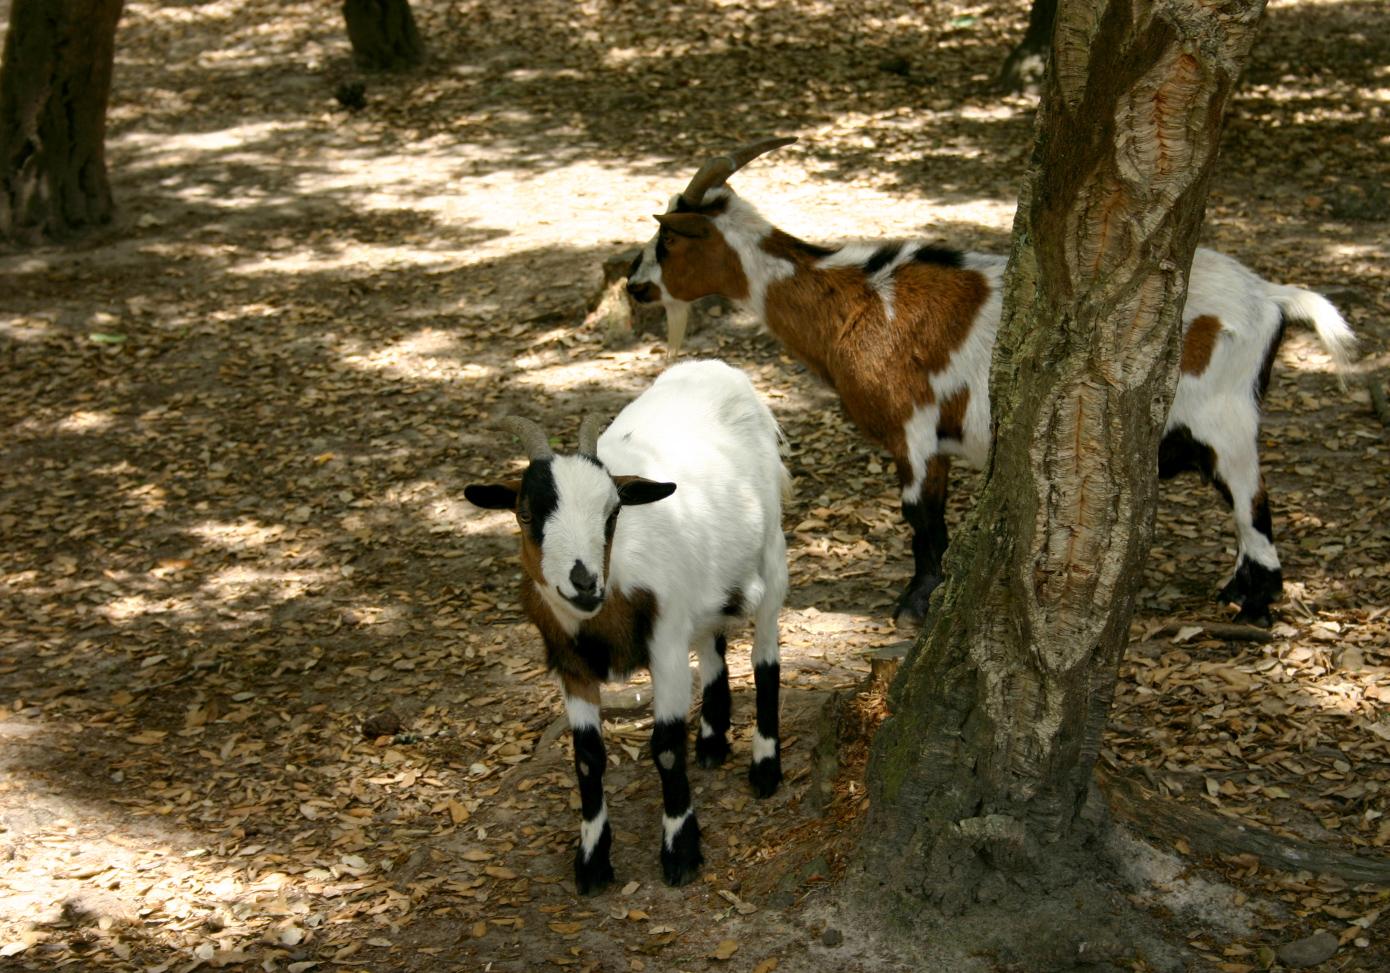 goat-1-1058416